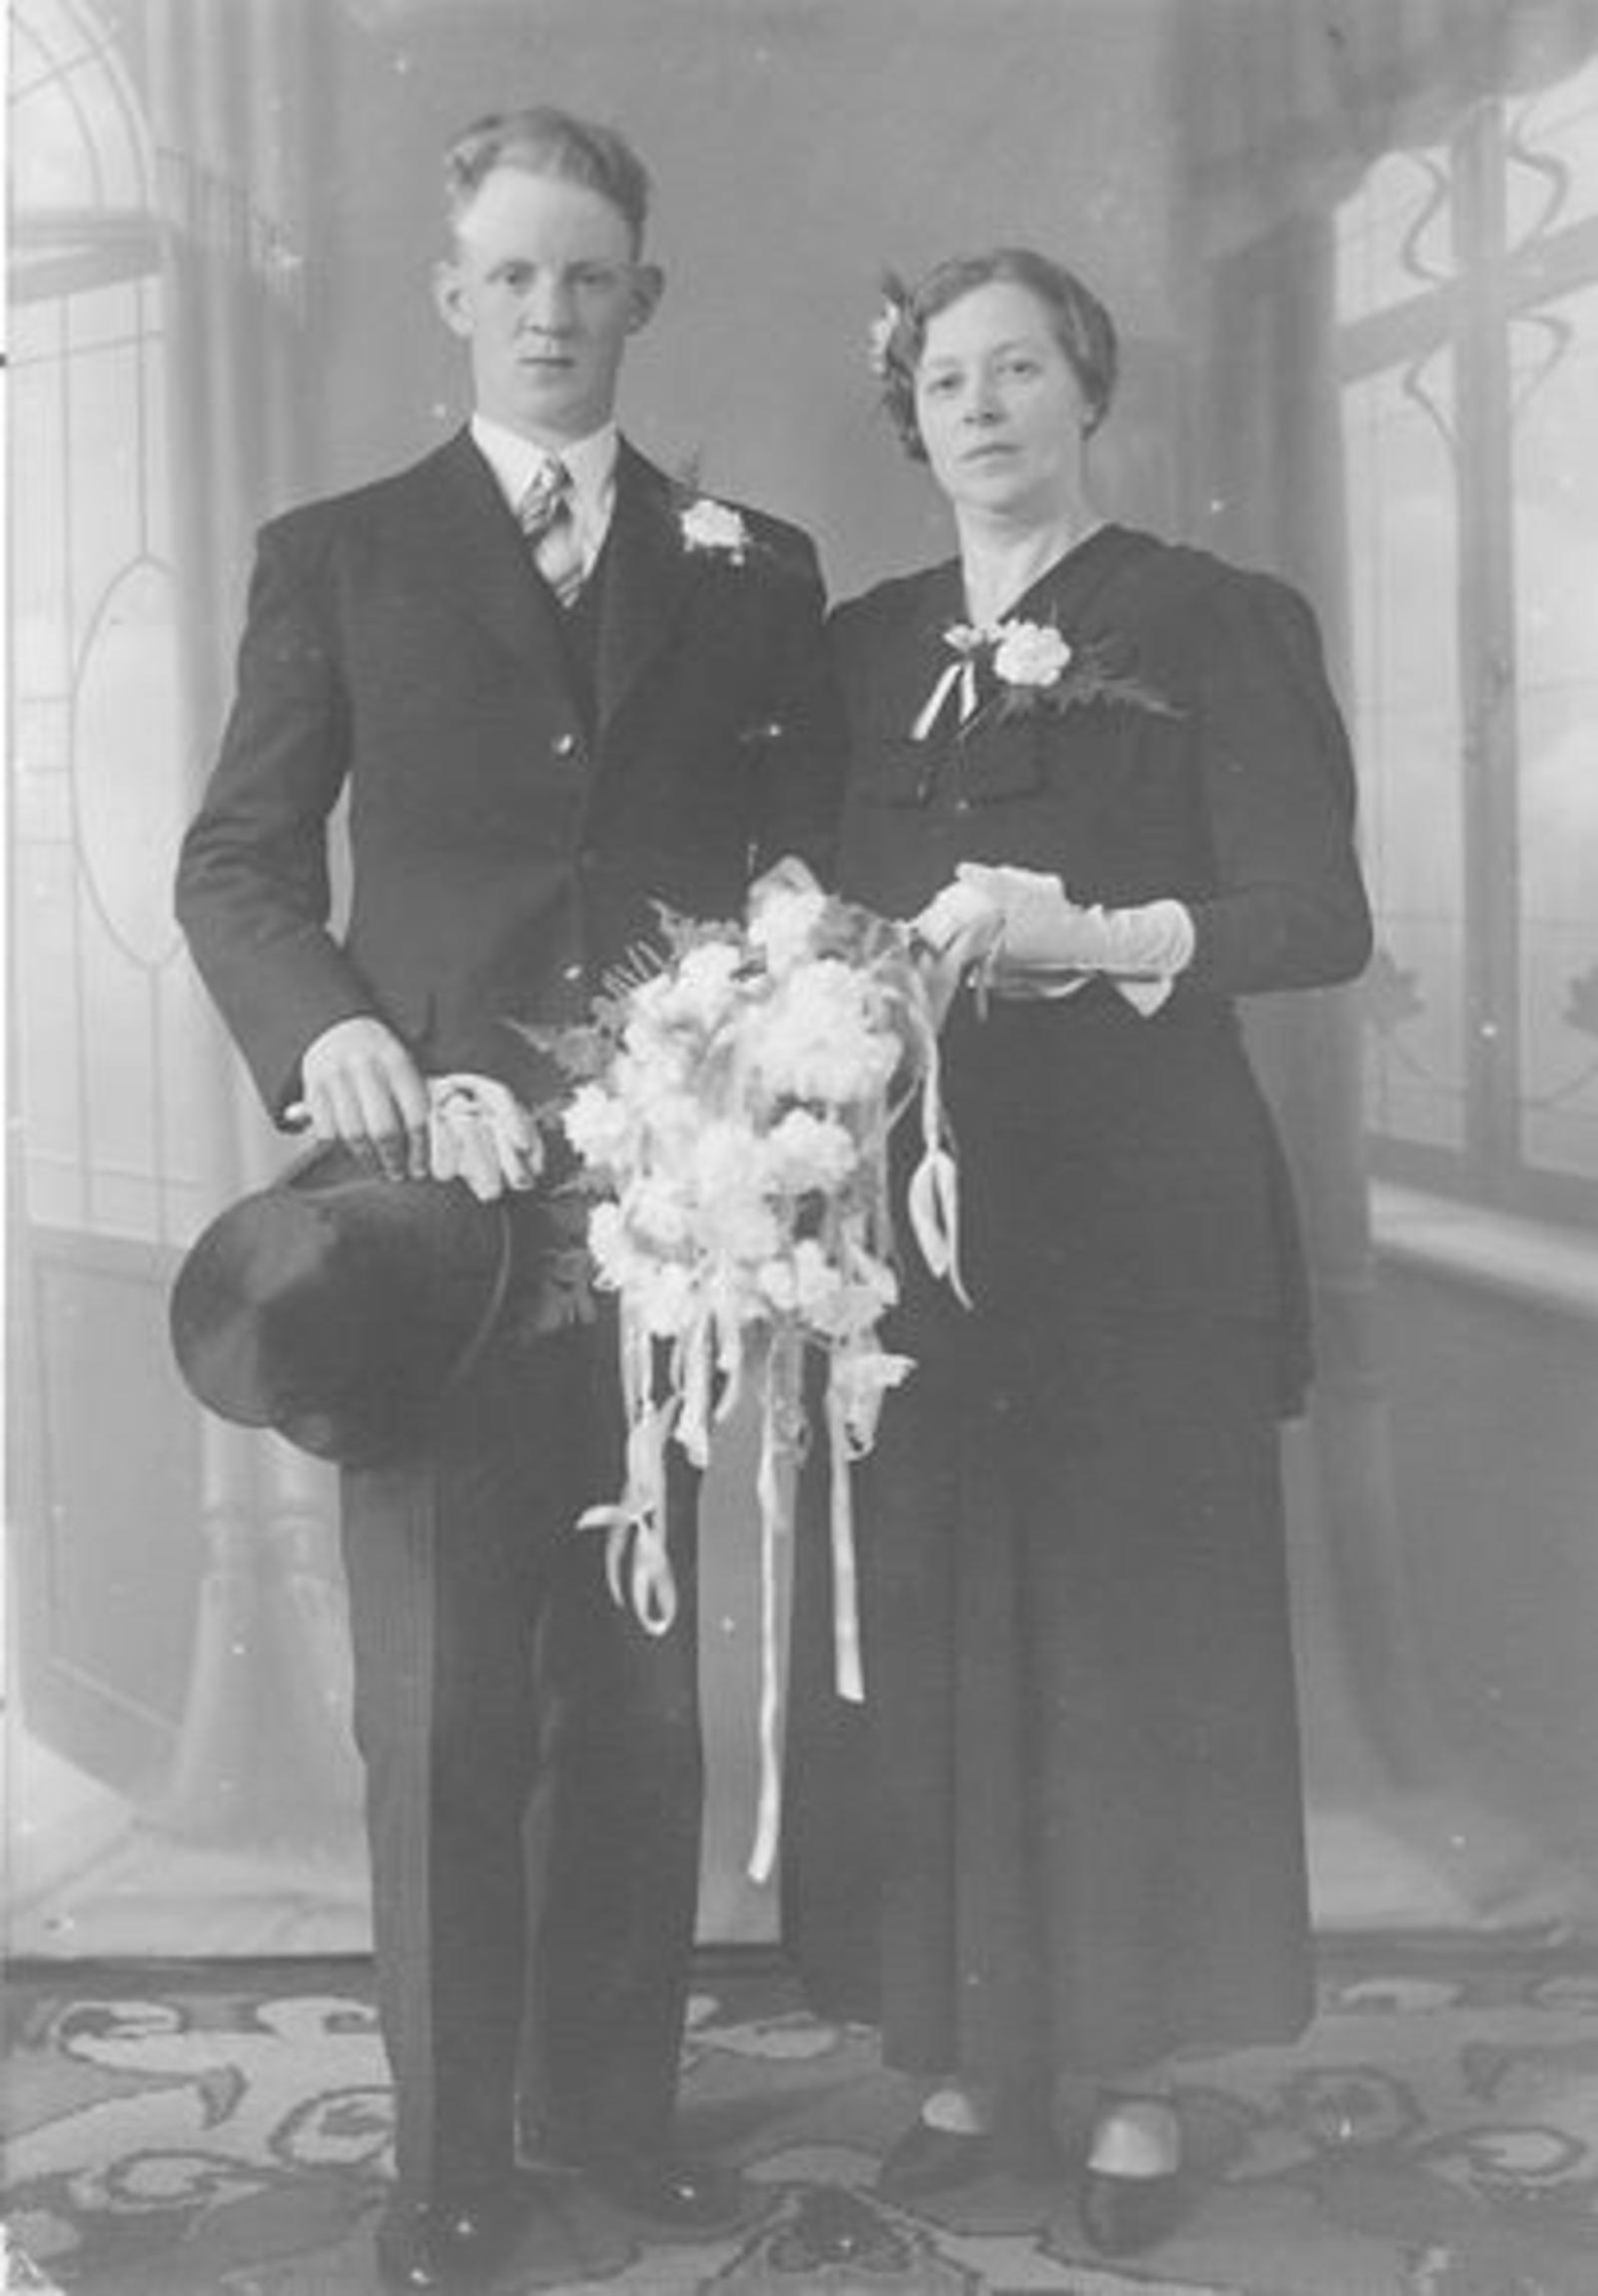 Zanten Bets v AbrDr 1898 1937 trouwt Jan Bisschop